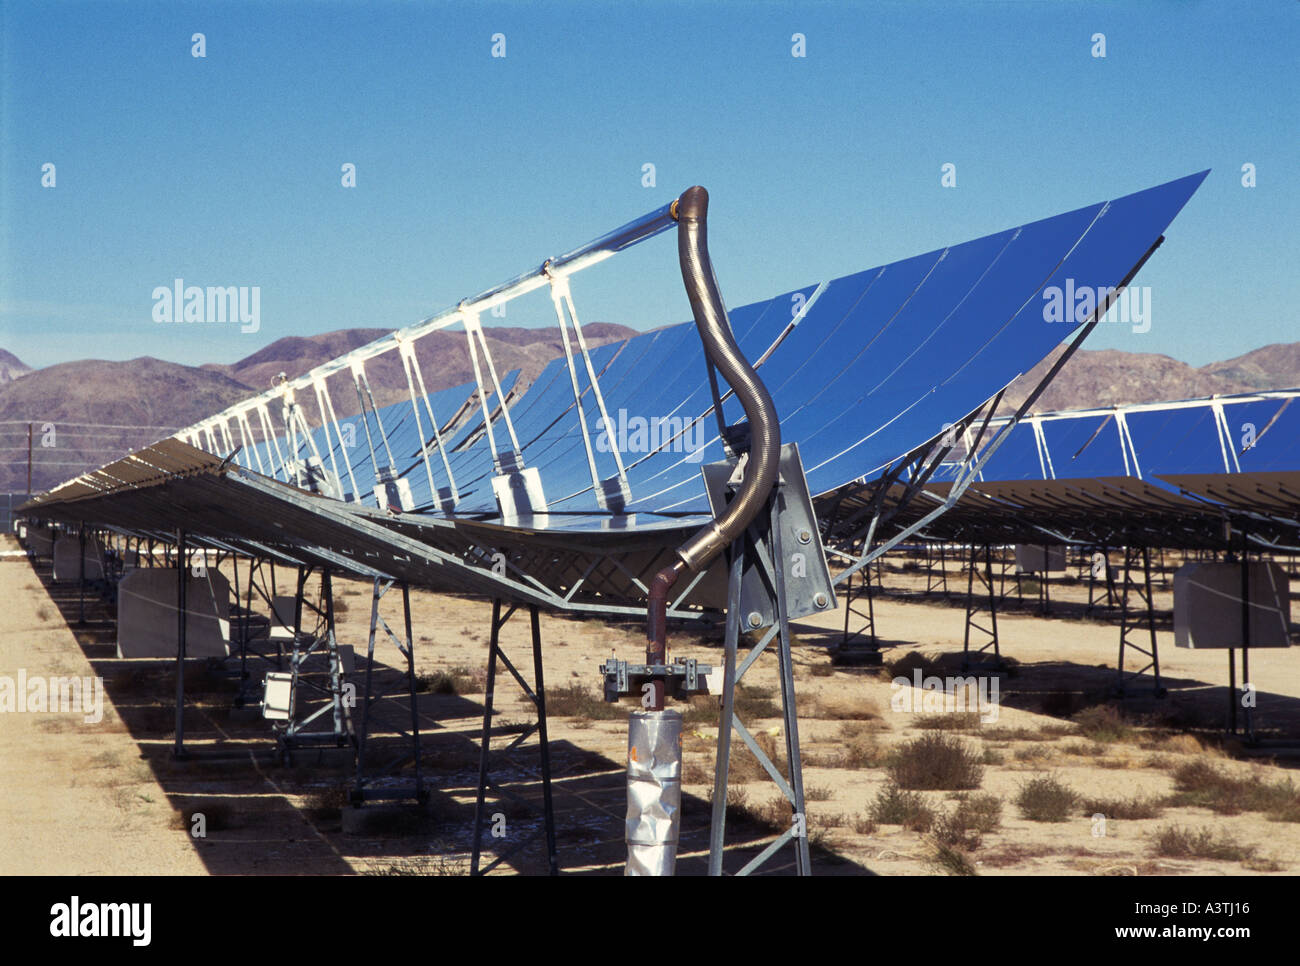 Solar Panels, California USA - Stock Image